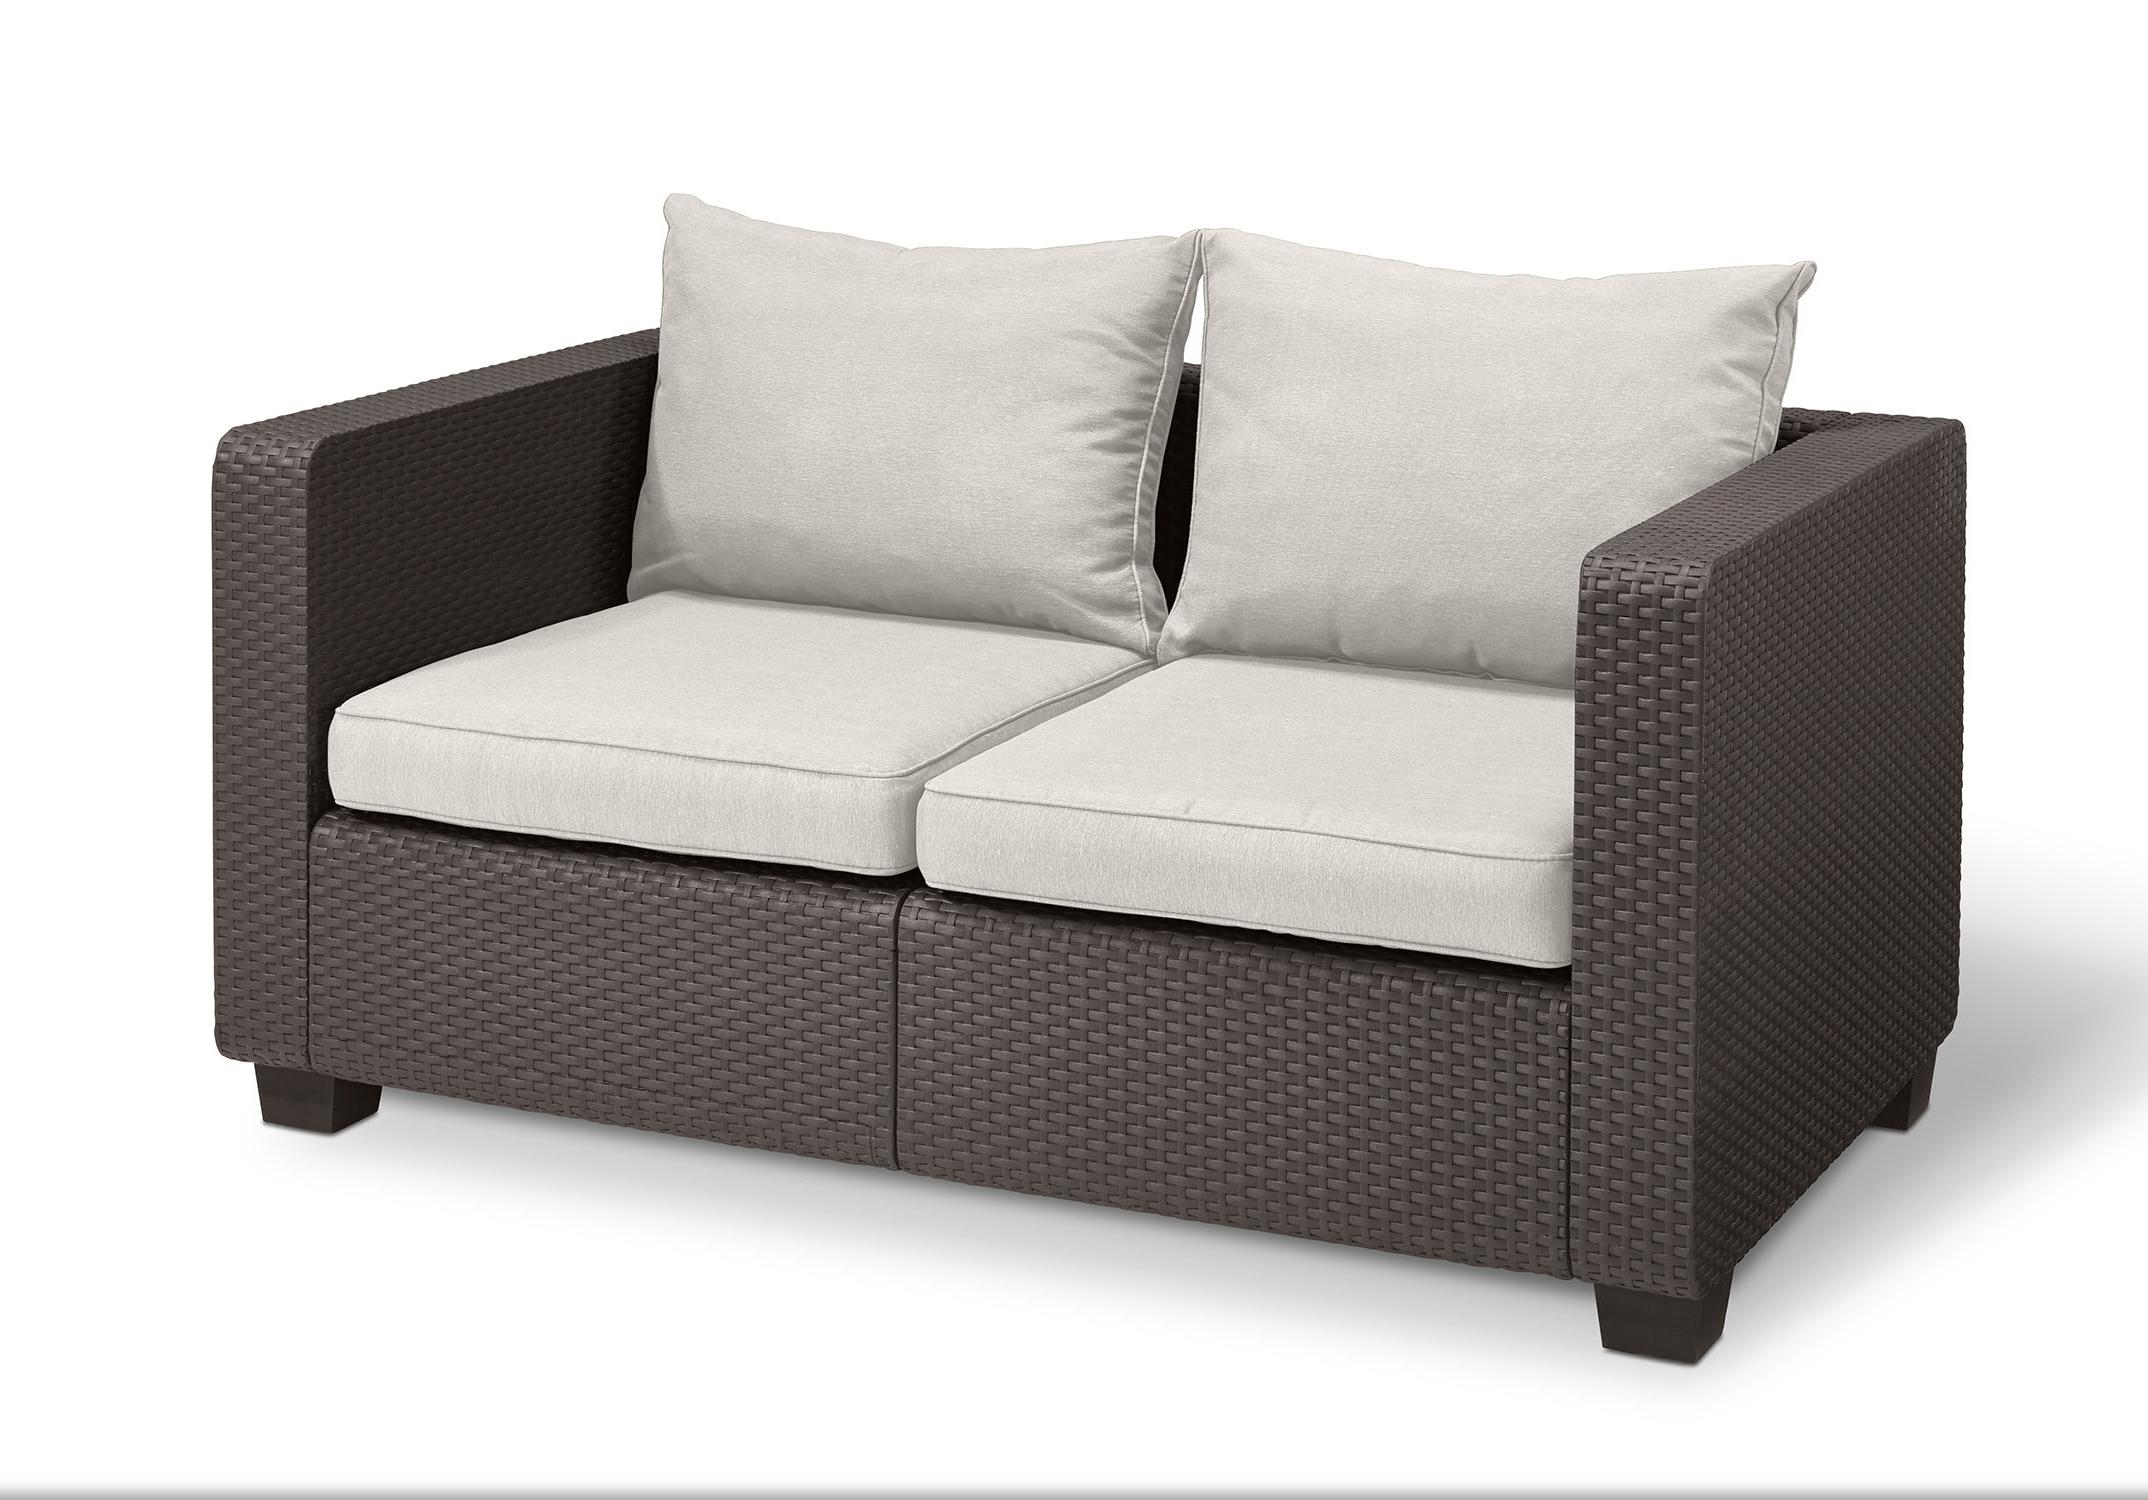 Current Halloran Loveseat With Sunbrella Cushions With Mosca Patio Loveseats With Cushions (View 2 of 20)